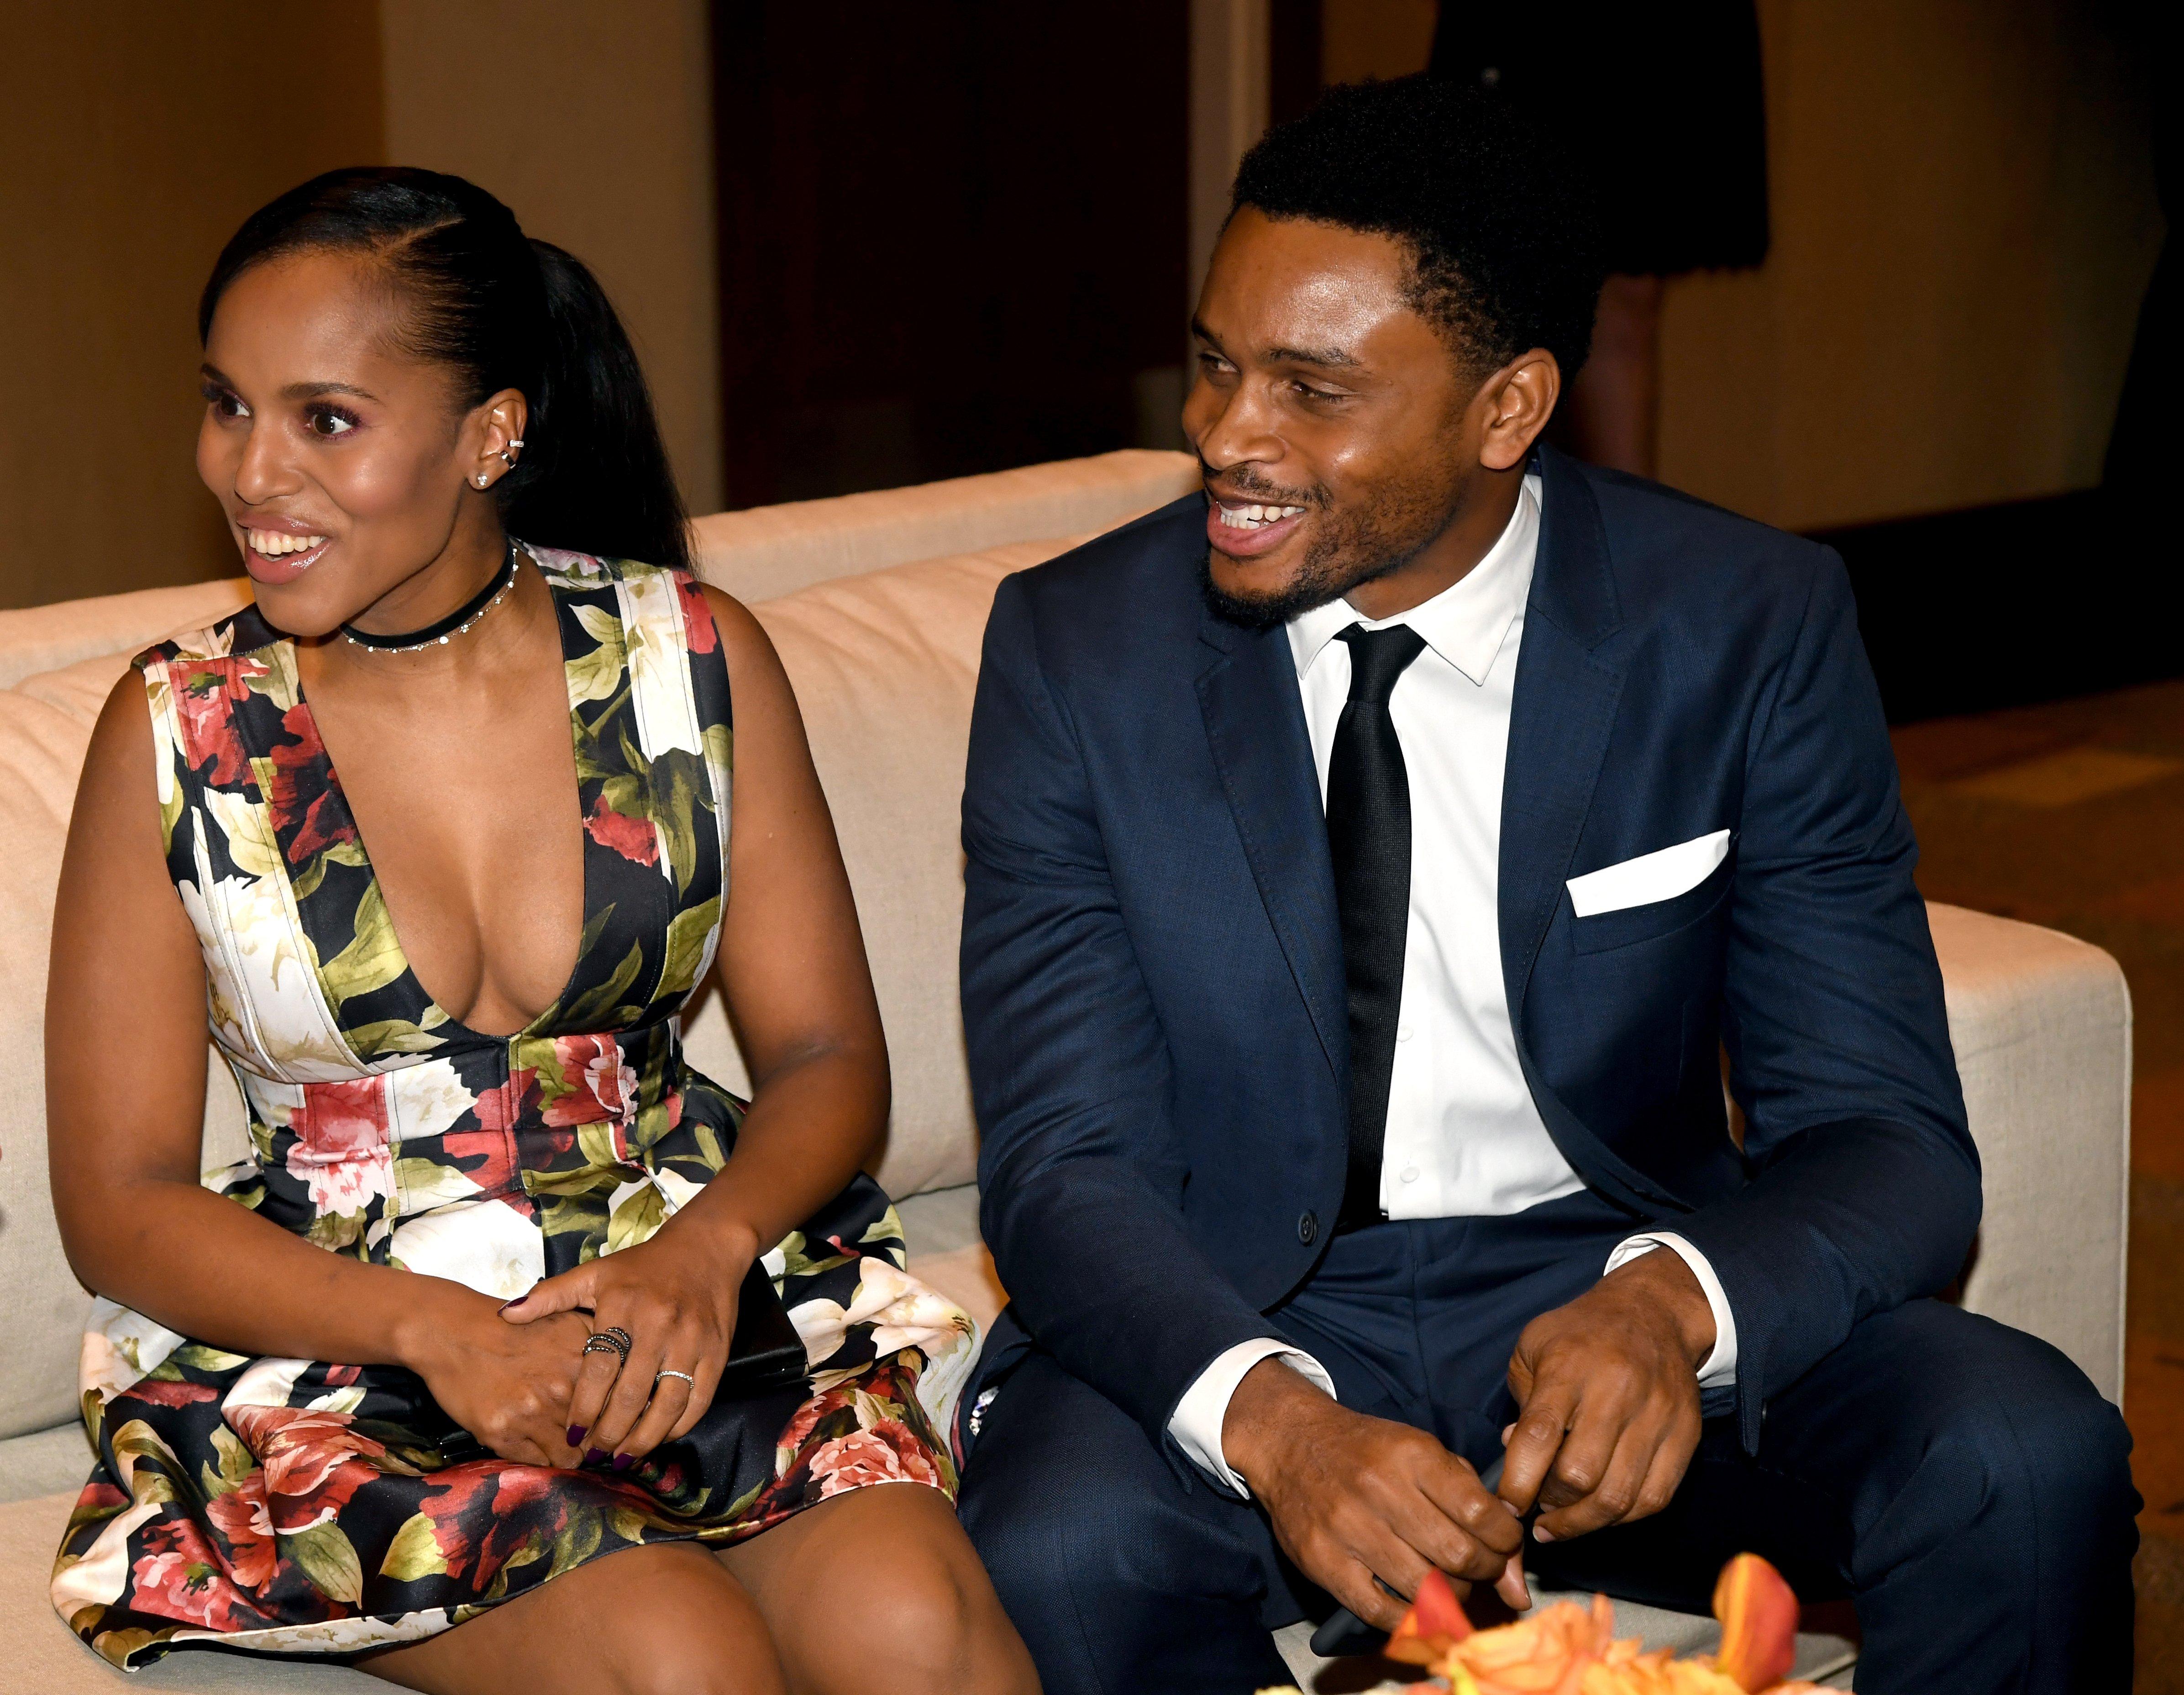 Kerry Washington and husband Nnamdi Asomugha attend the Ambassadors for Humanity Gala Benefiting USC Shoah Foundation at The Ray Dolby Ballroom at Hollywood & Highland Center on December 8, 2016 in Hollywood